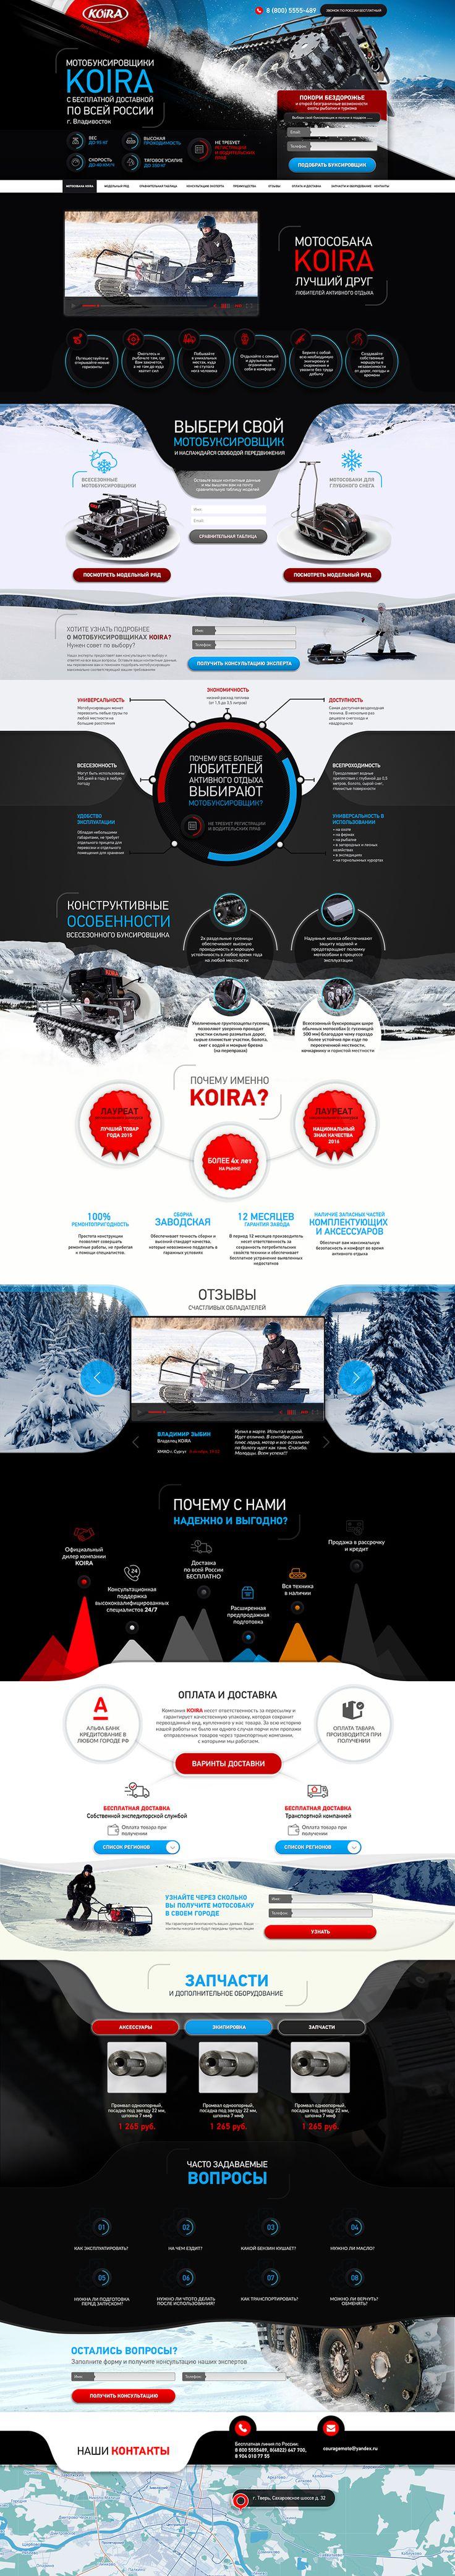 KOIRA  #landing, #page, #design, #web, #UI/UX, #HTML5, #photoshop, #website, #snow, #extreme,